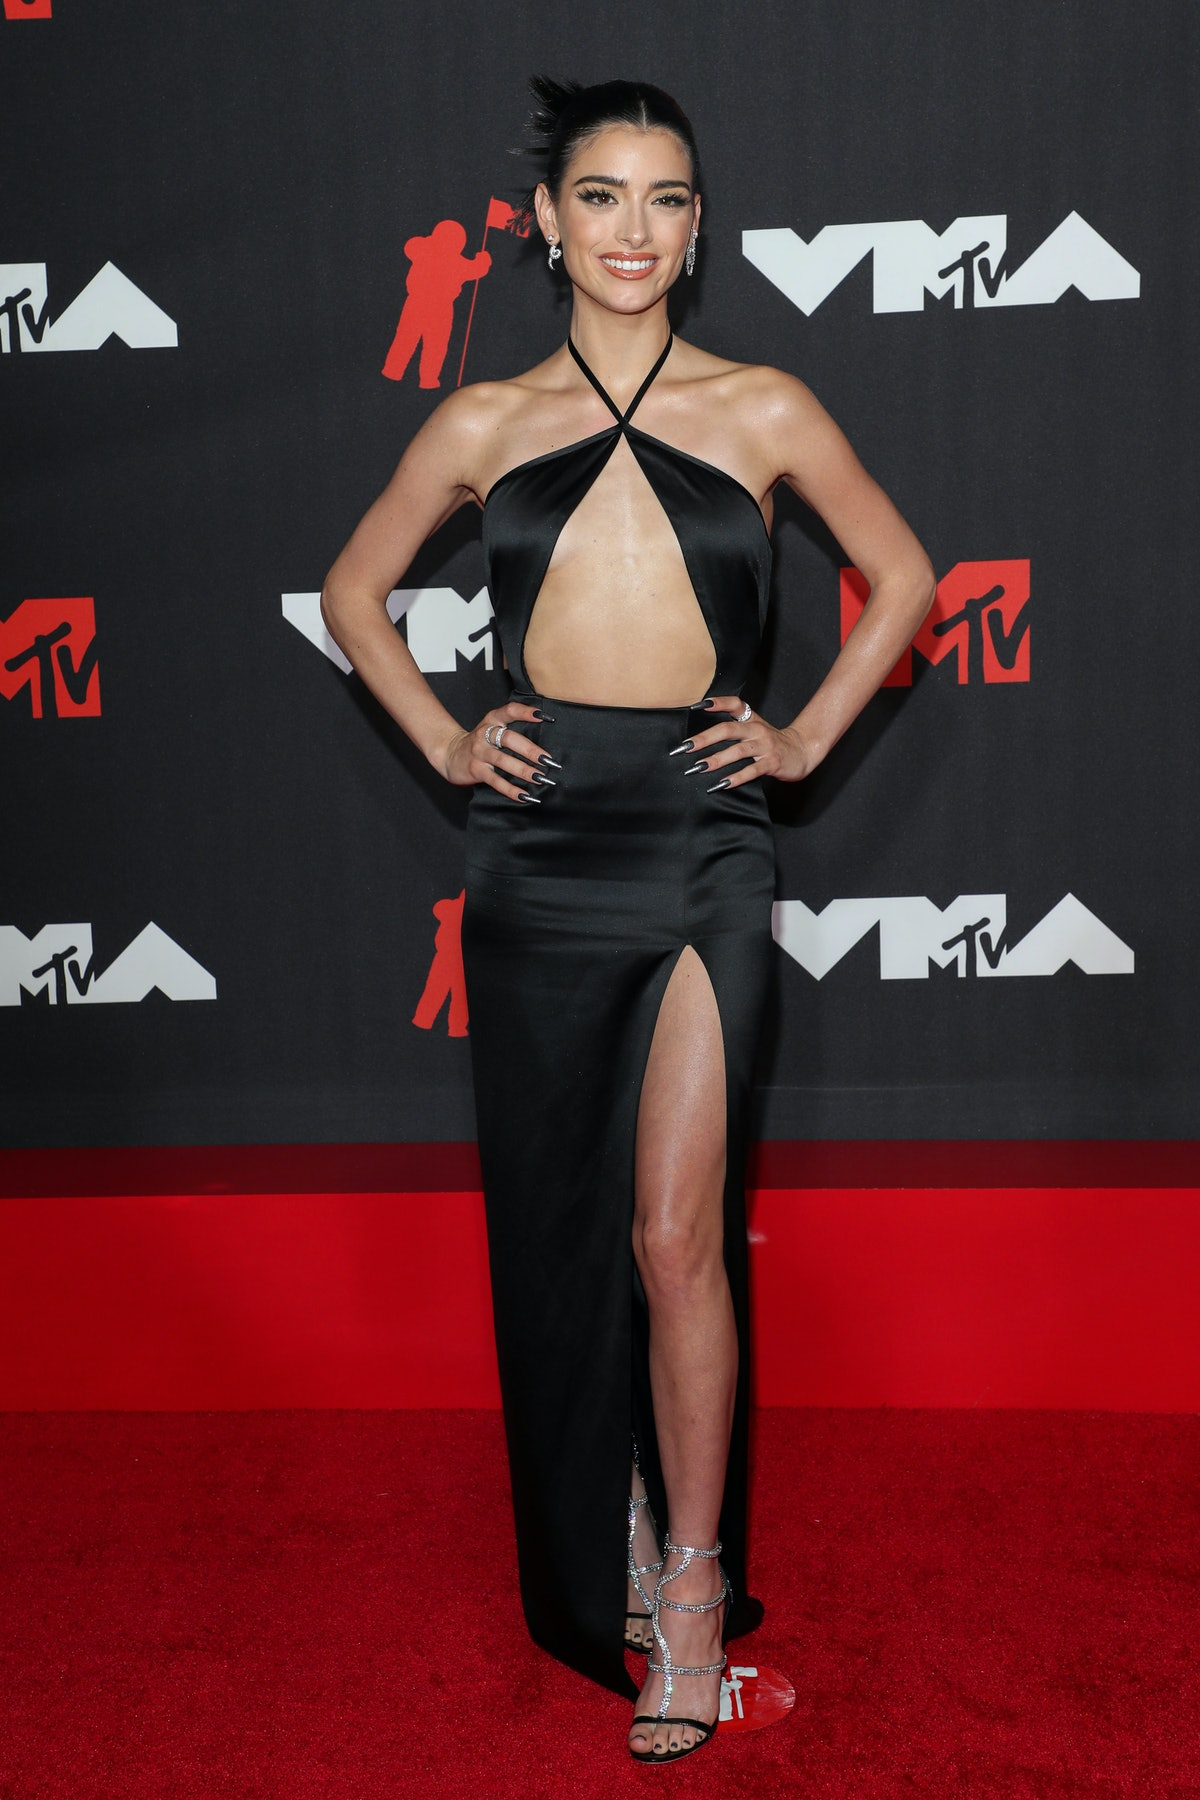 Dixie D'Amelio wore a black satin cutout dress to the VMAs